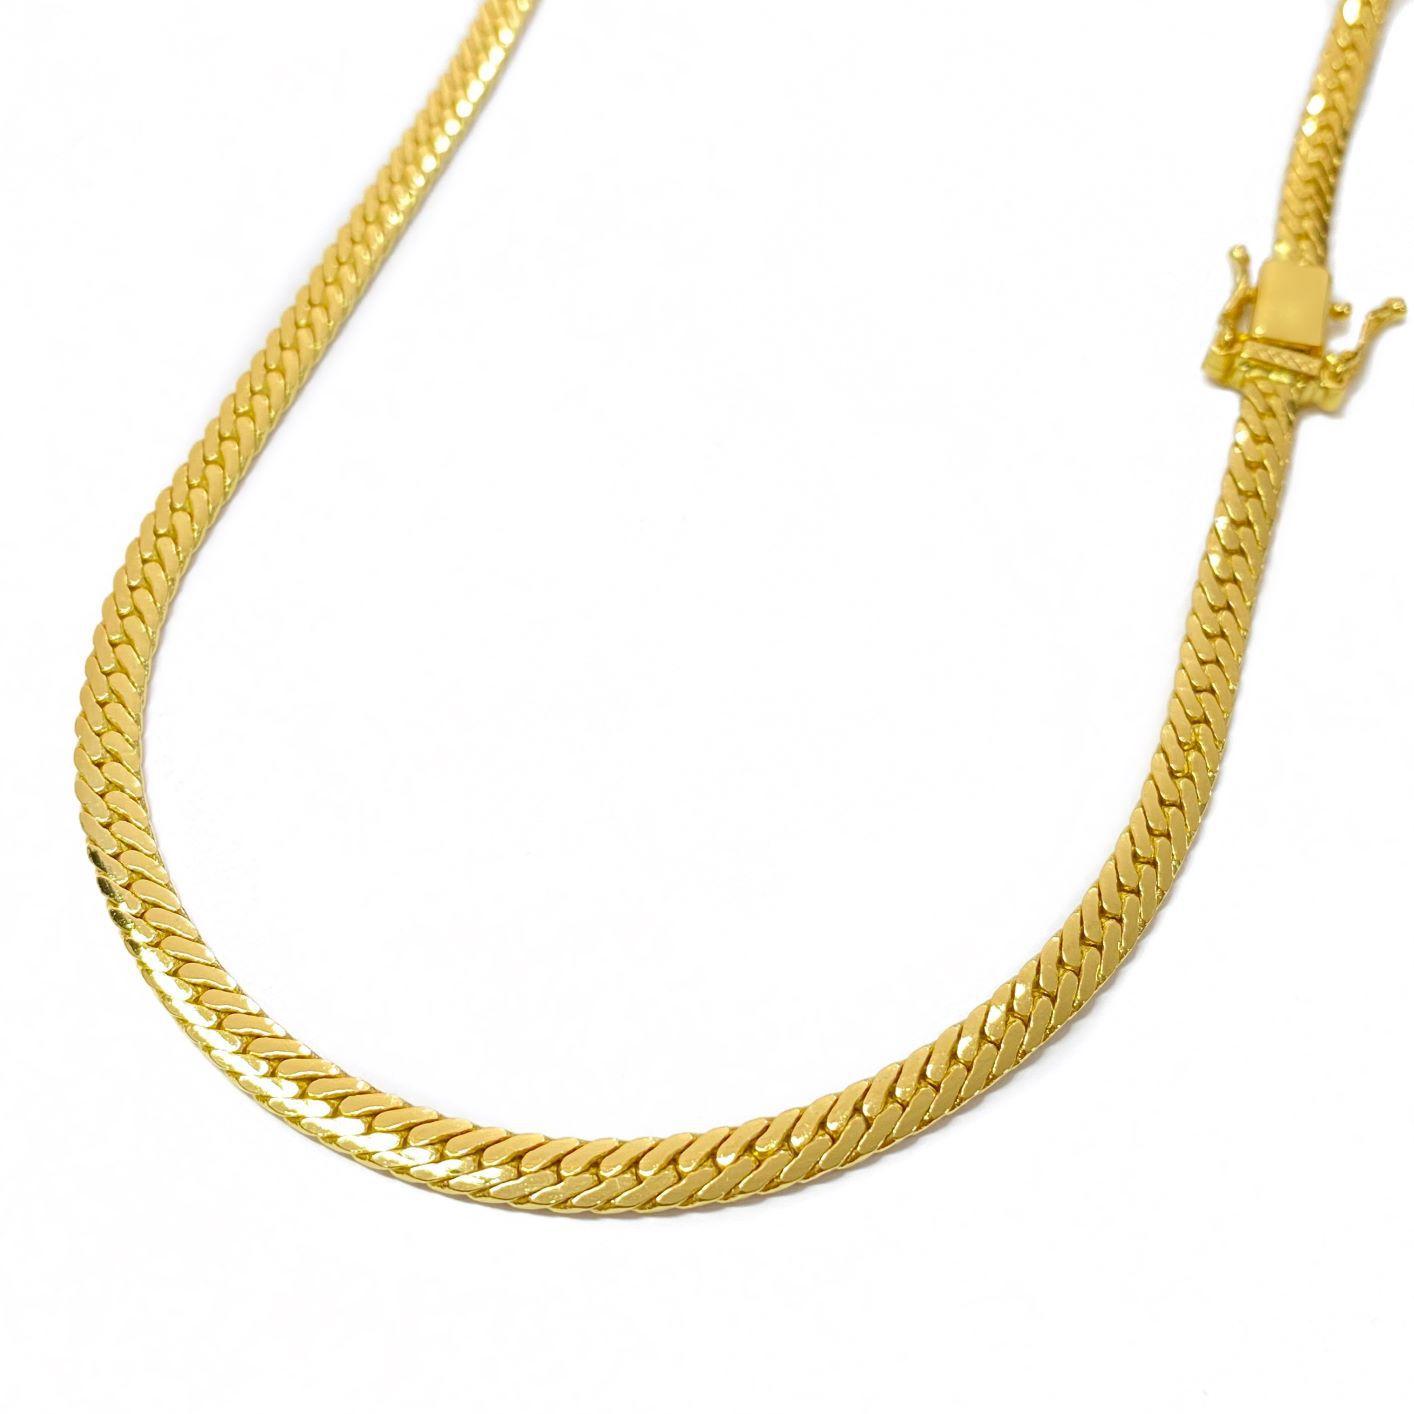 Corrente Lacraia 4,5mm 70cm 32g (Fecho Gaveta Duplo) (Banho Ouro 24K)